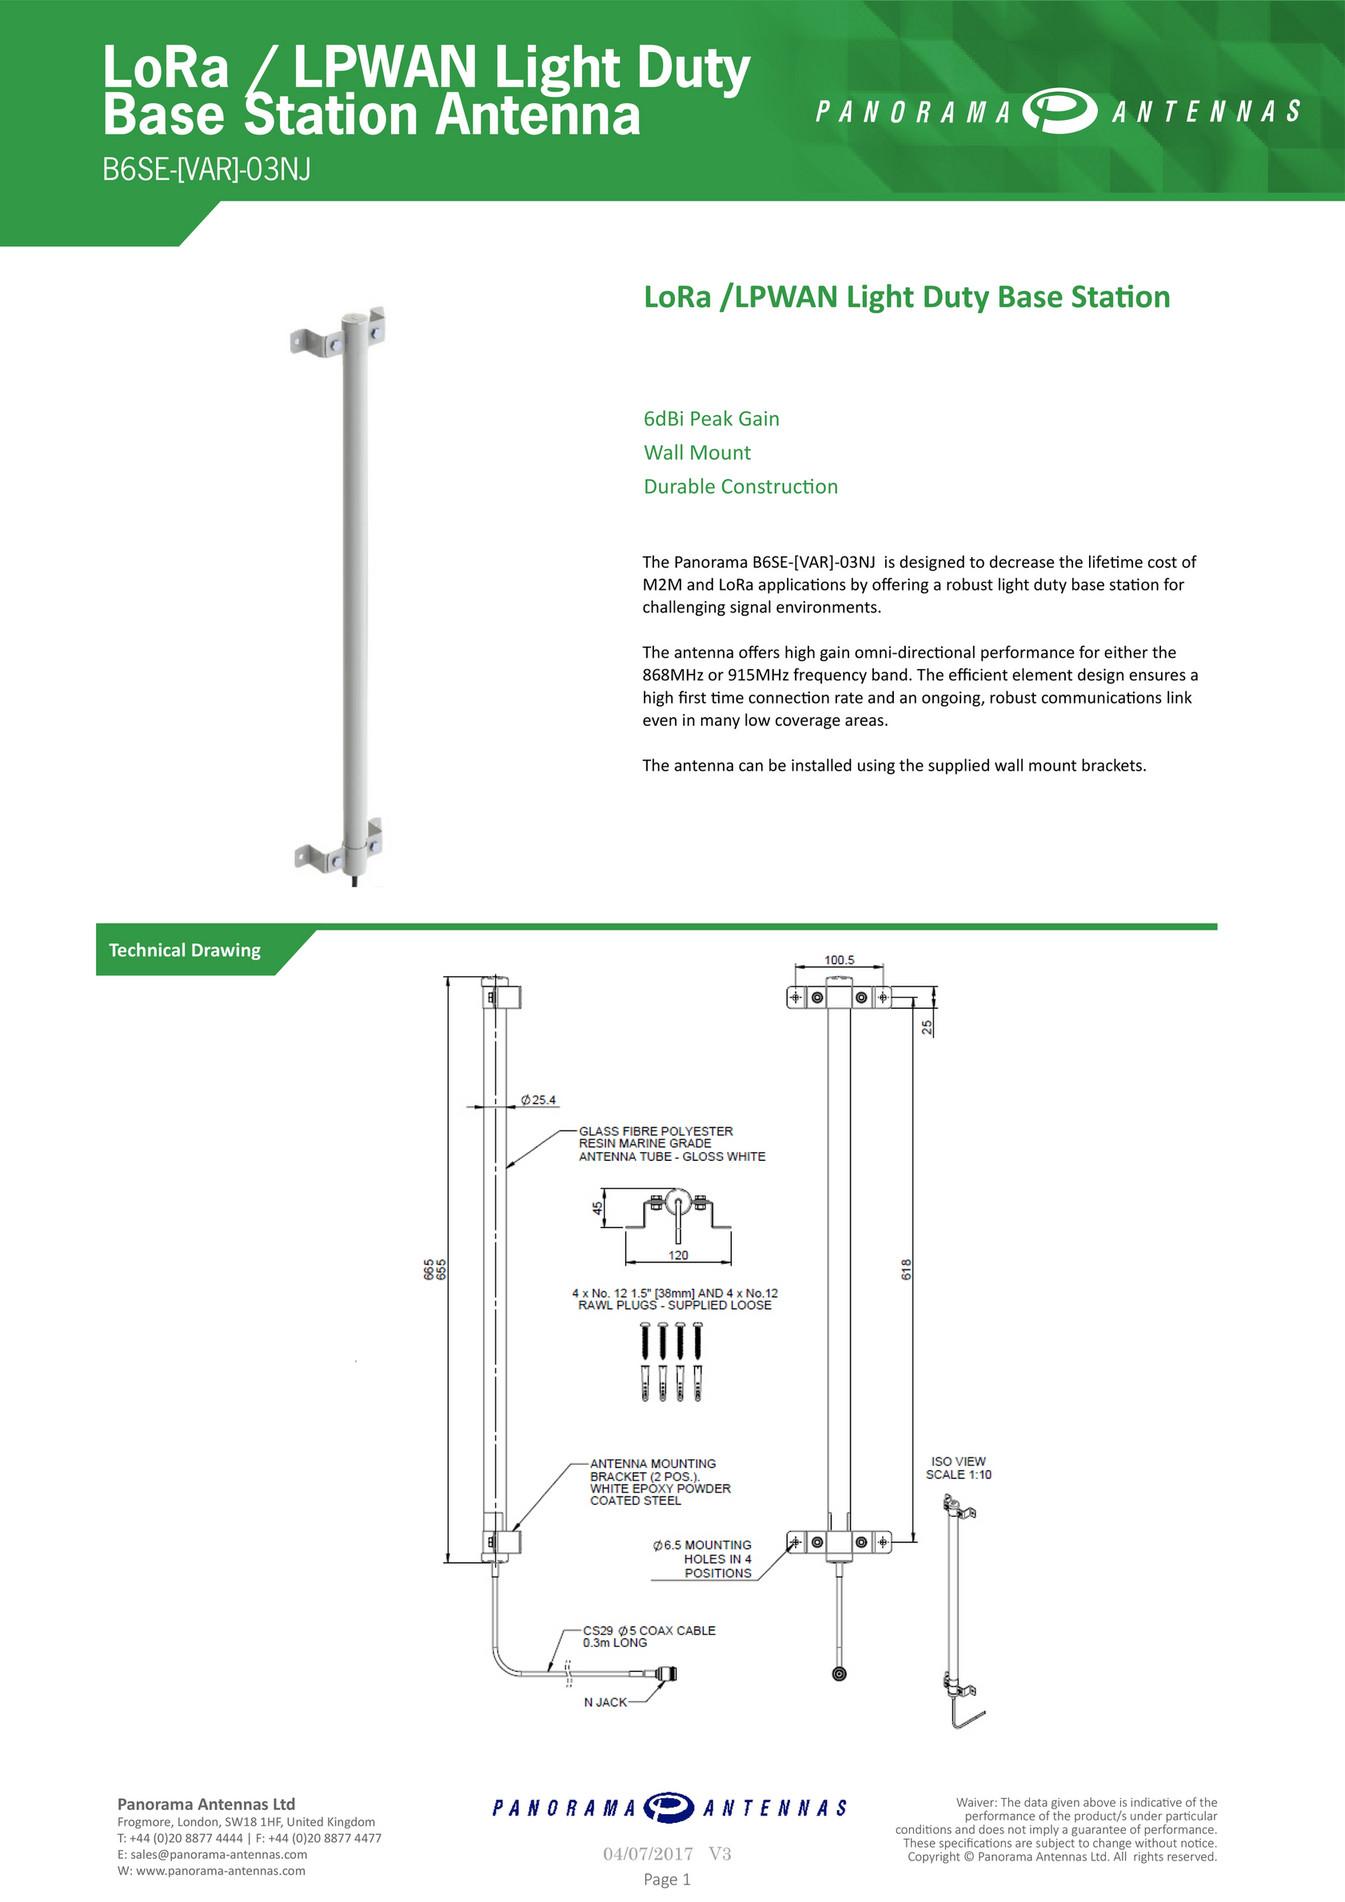 Panorama Antennas Ltd - B6SE-[VAR]-03NJ | LoRa / LPWAN Light